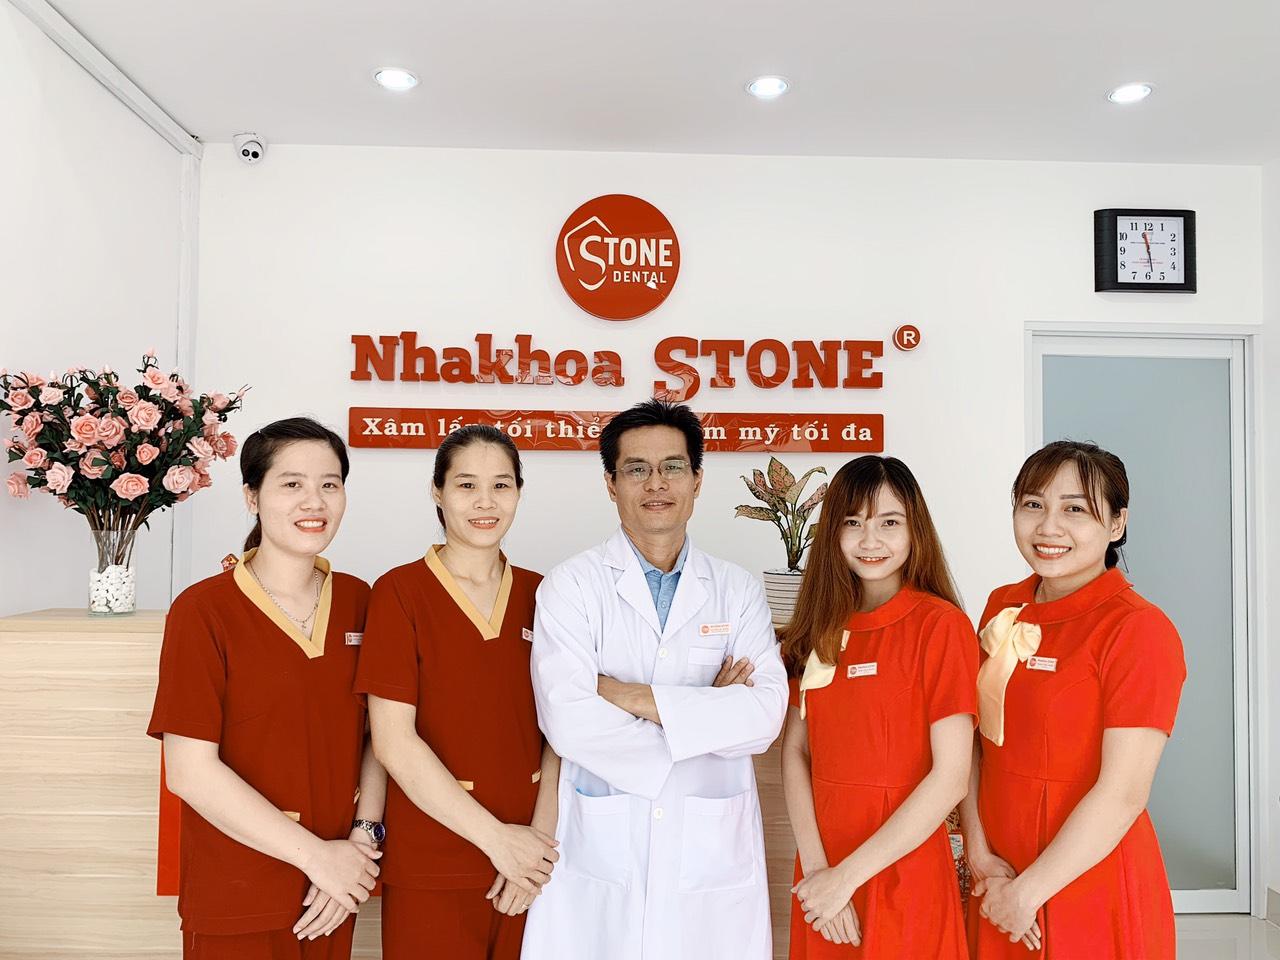 Giới thiệu về nha khoa Stone